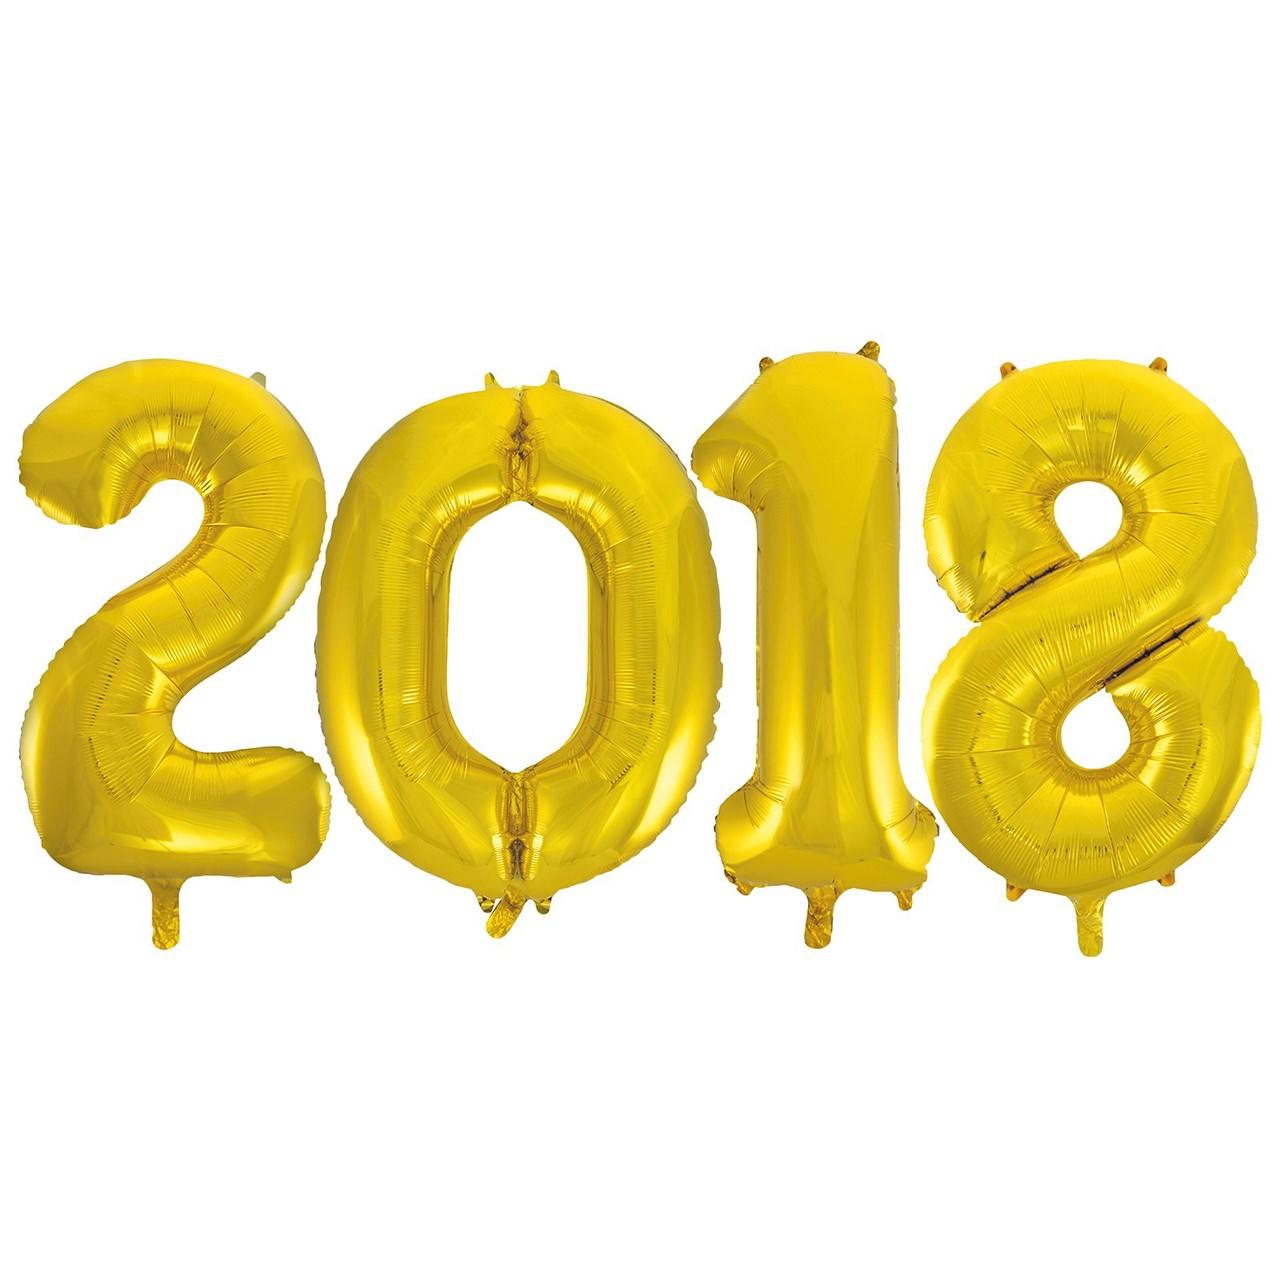 بادکنک فویلی کریسمس سورتک مدل ریسه دار 2018